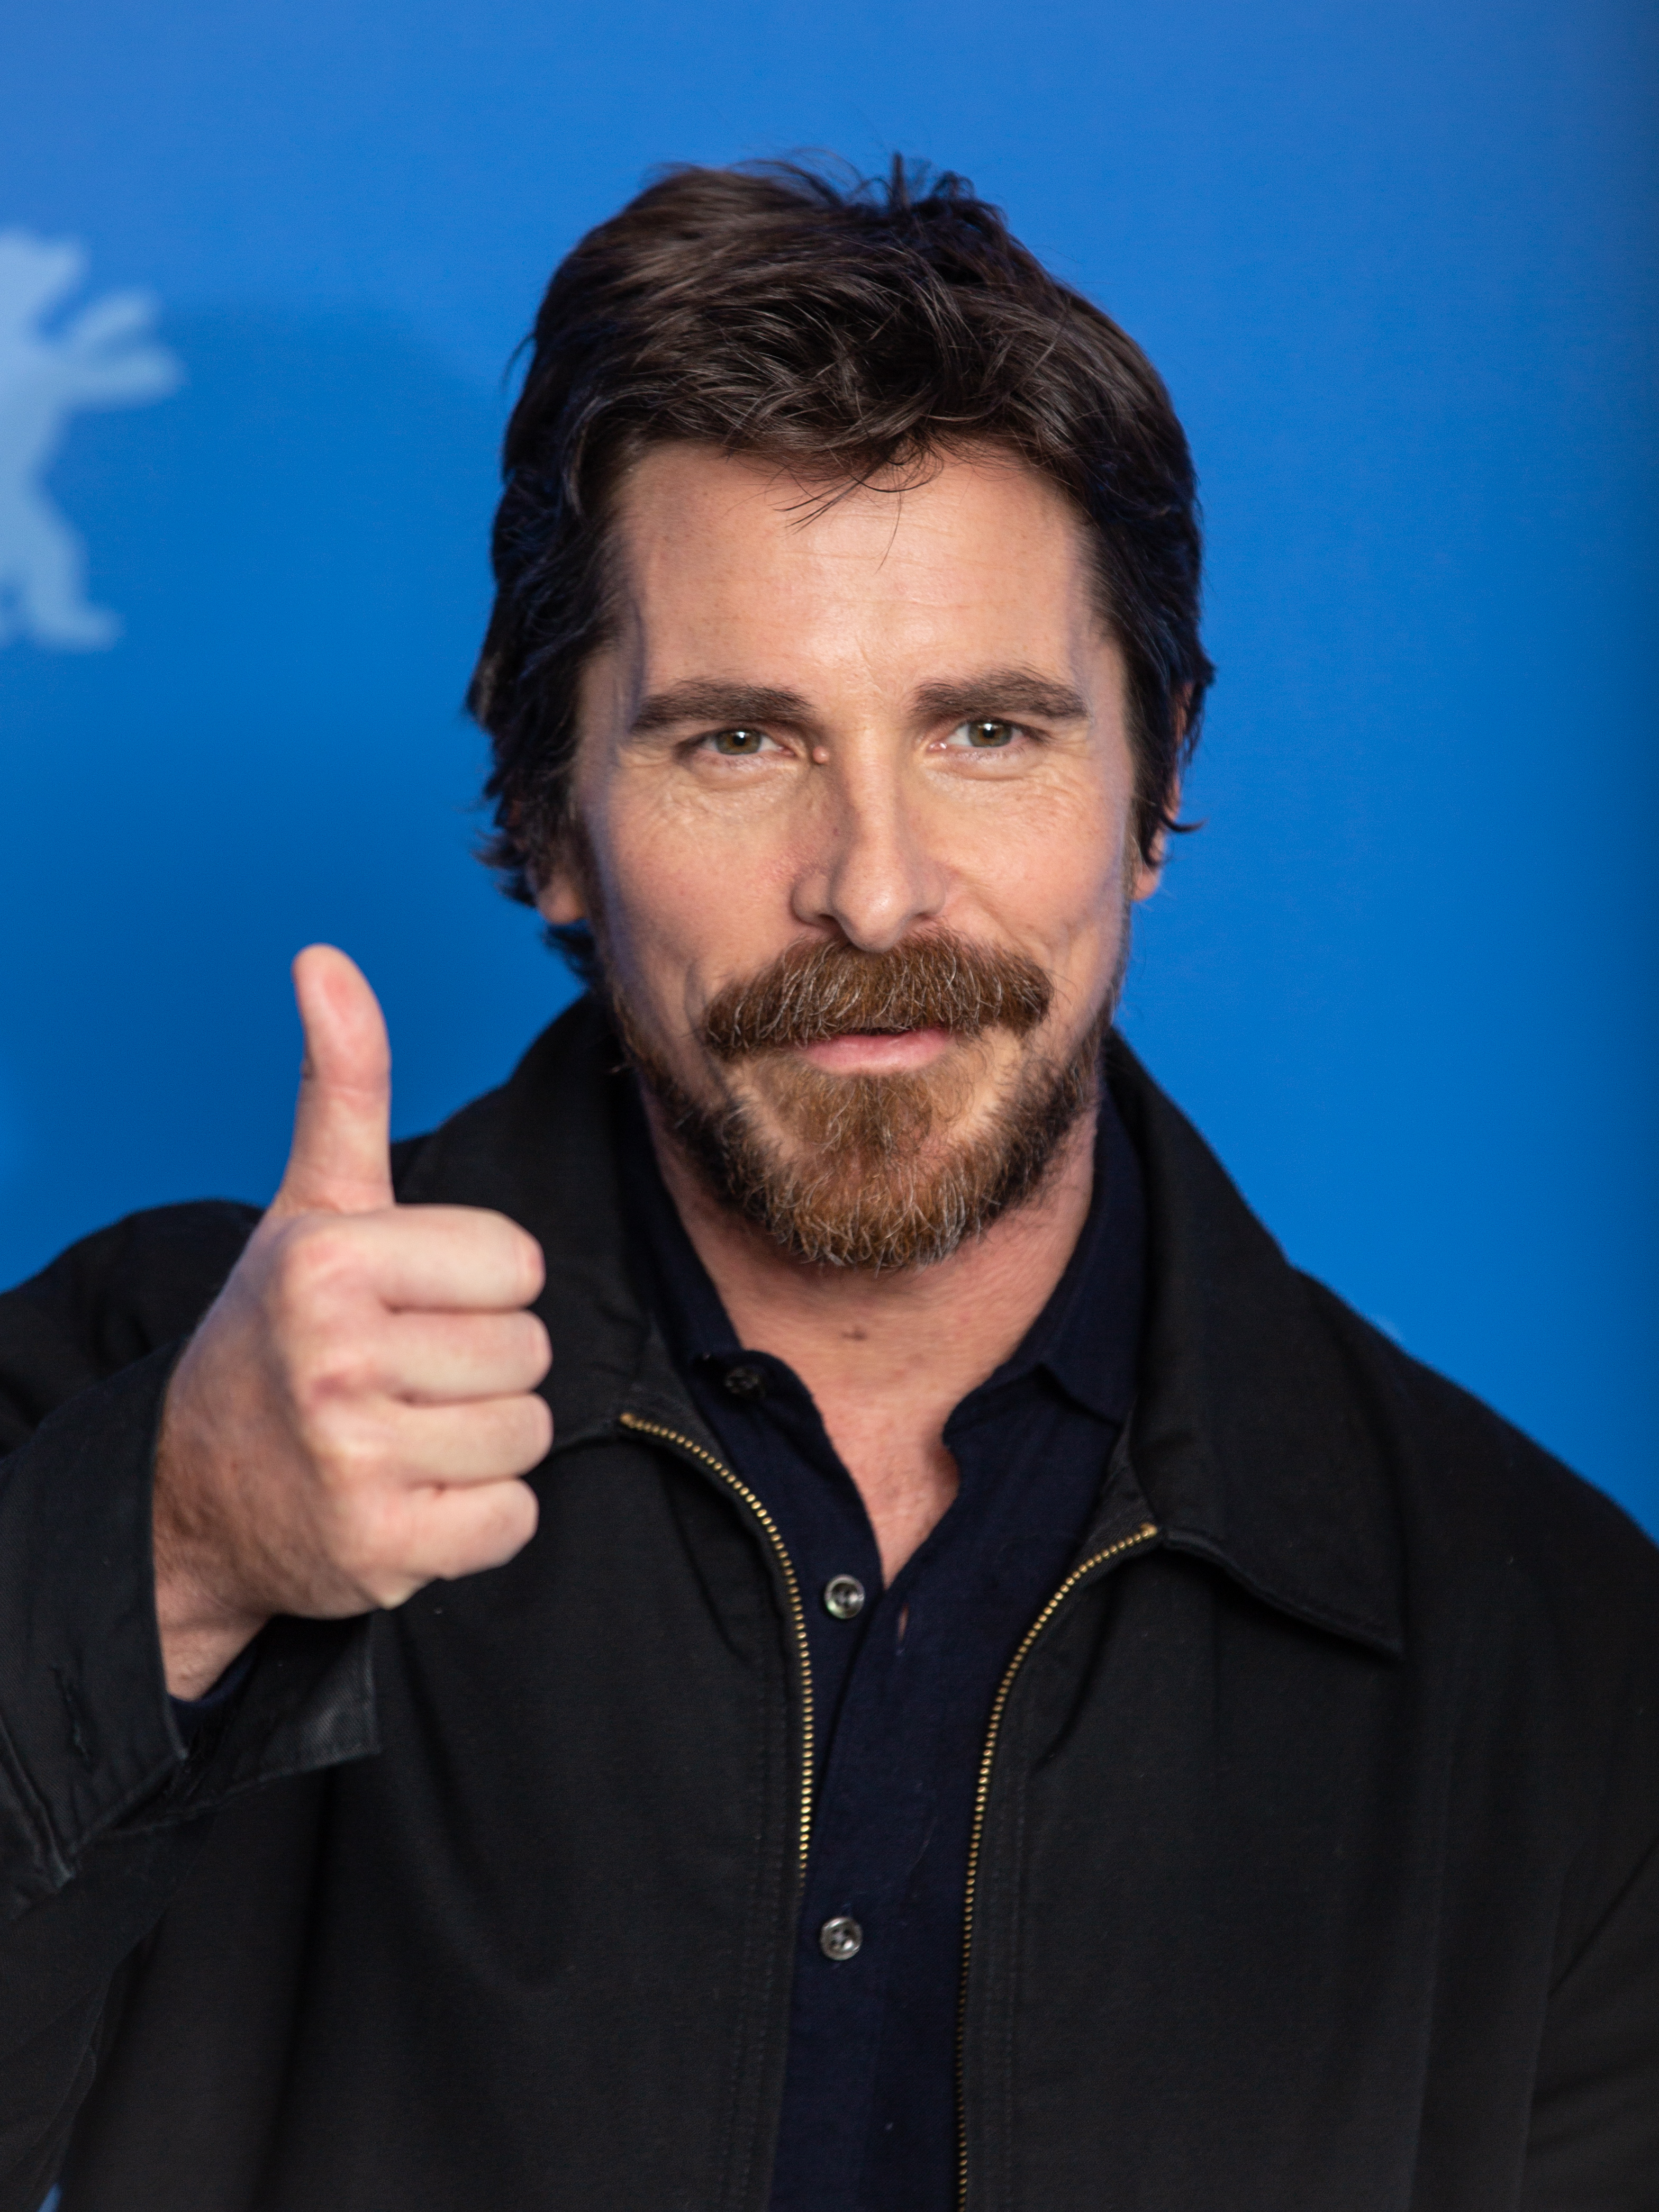 Christian Bale photo #111398, Christian Bale image